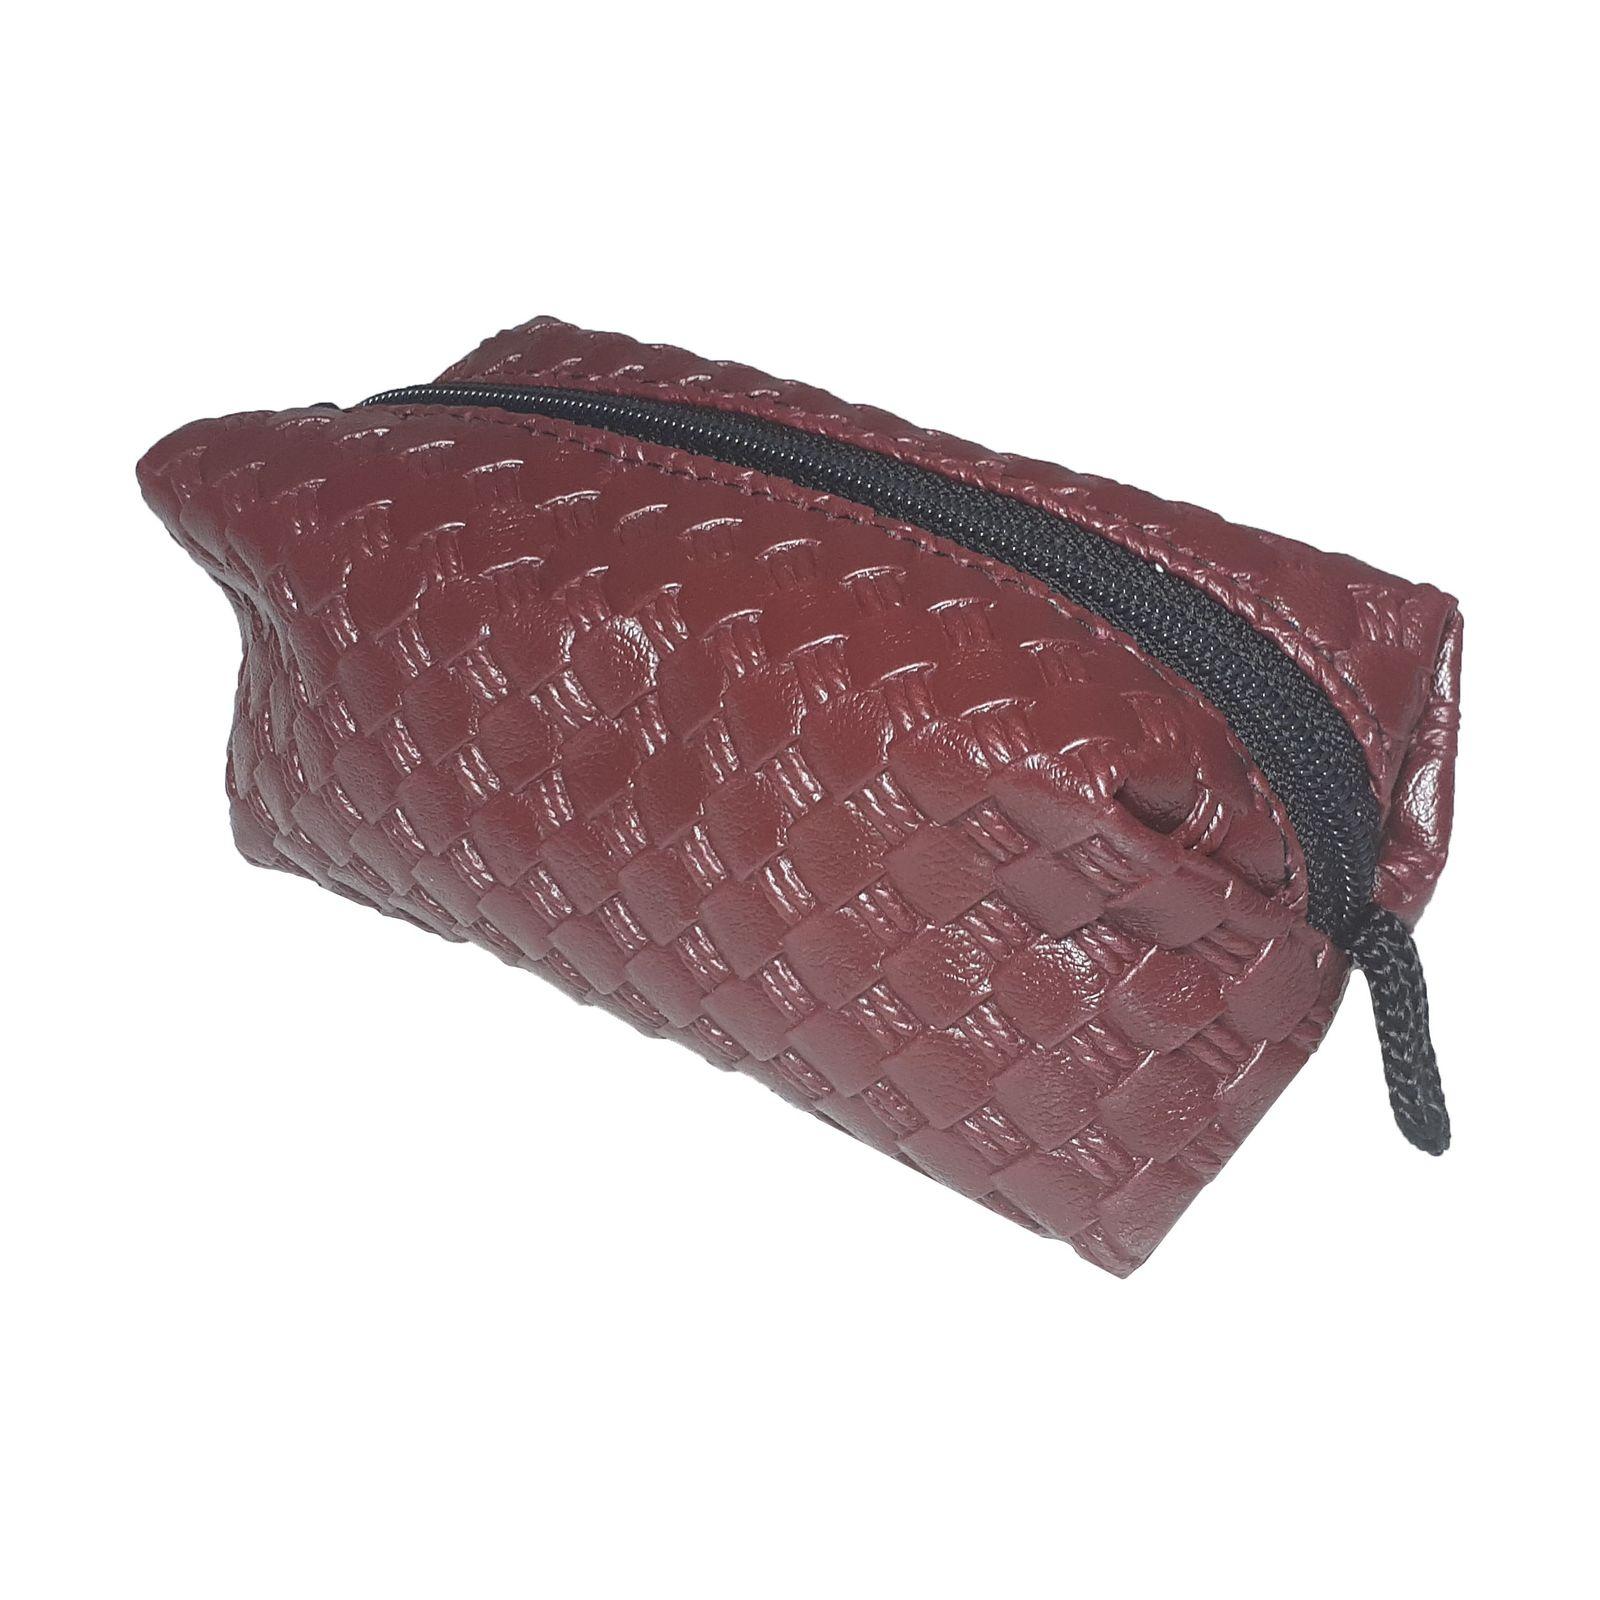 کیف لوازم آرایش زنانه کد GT0105 -  - 7